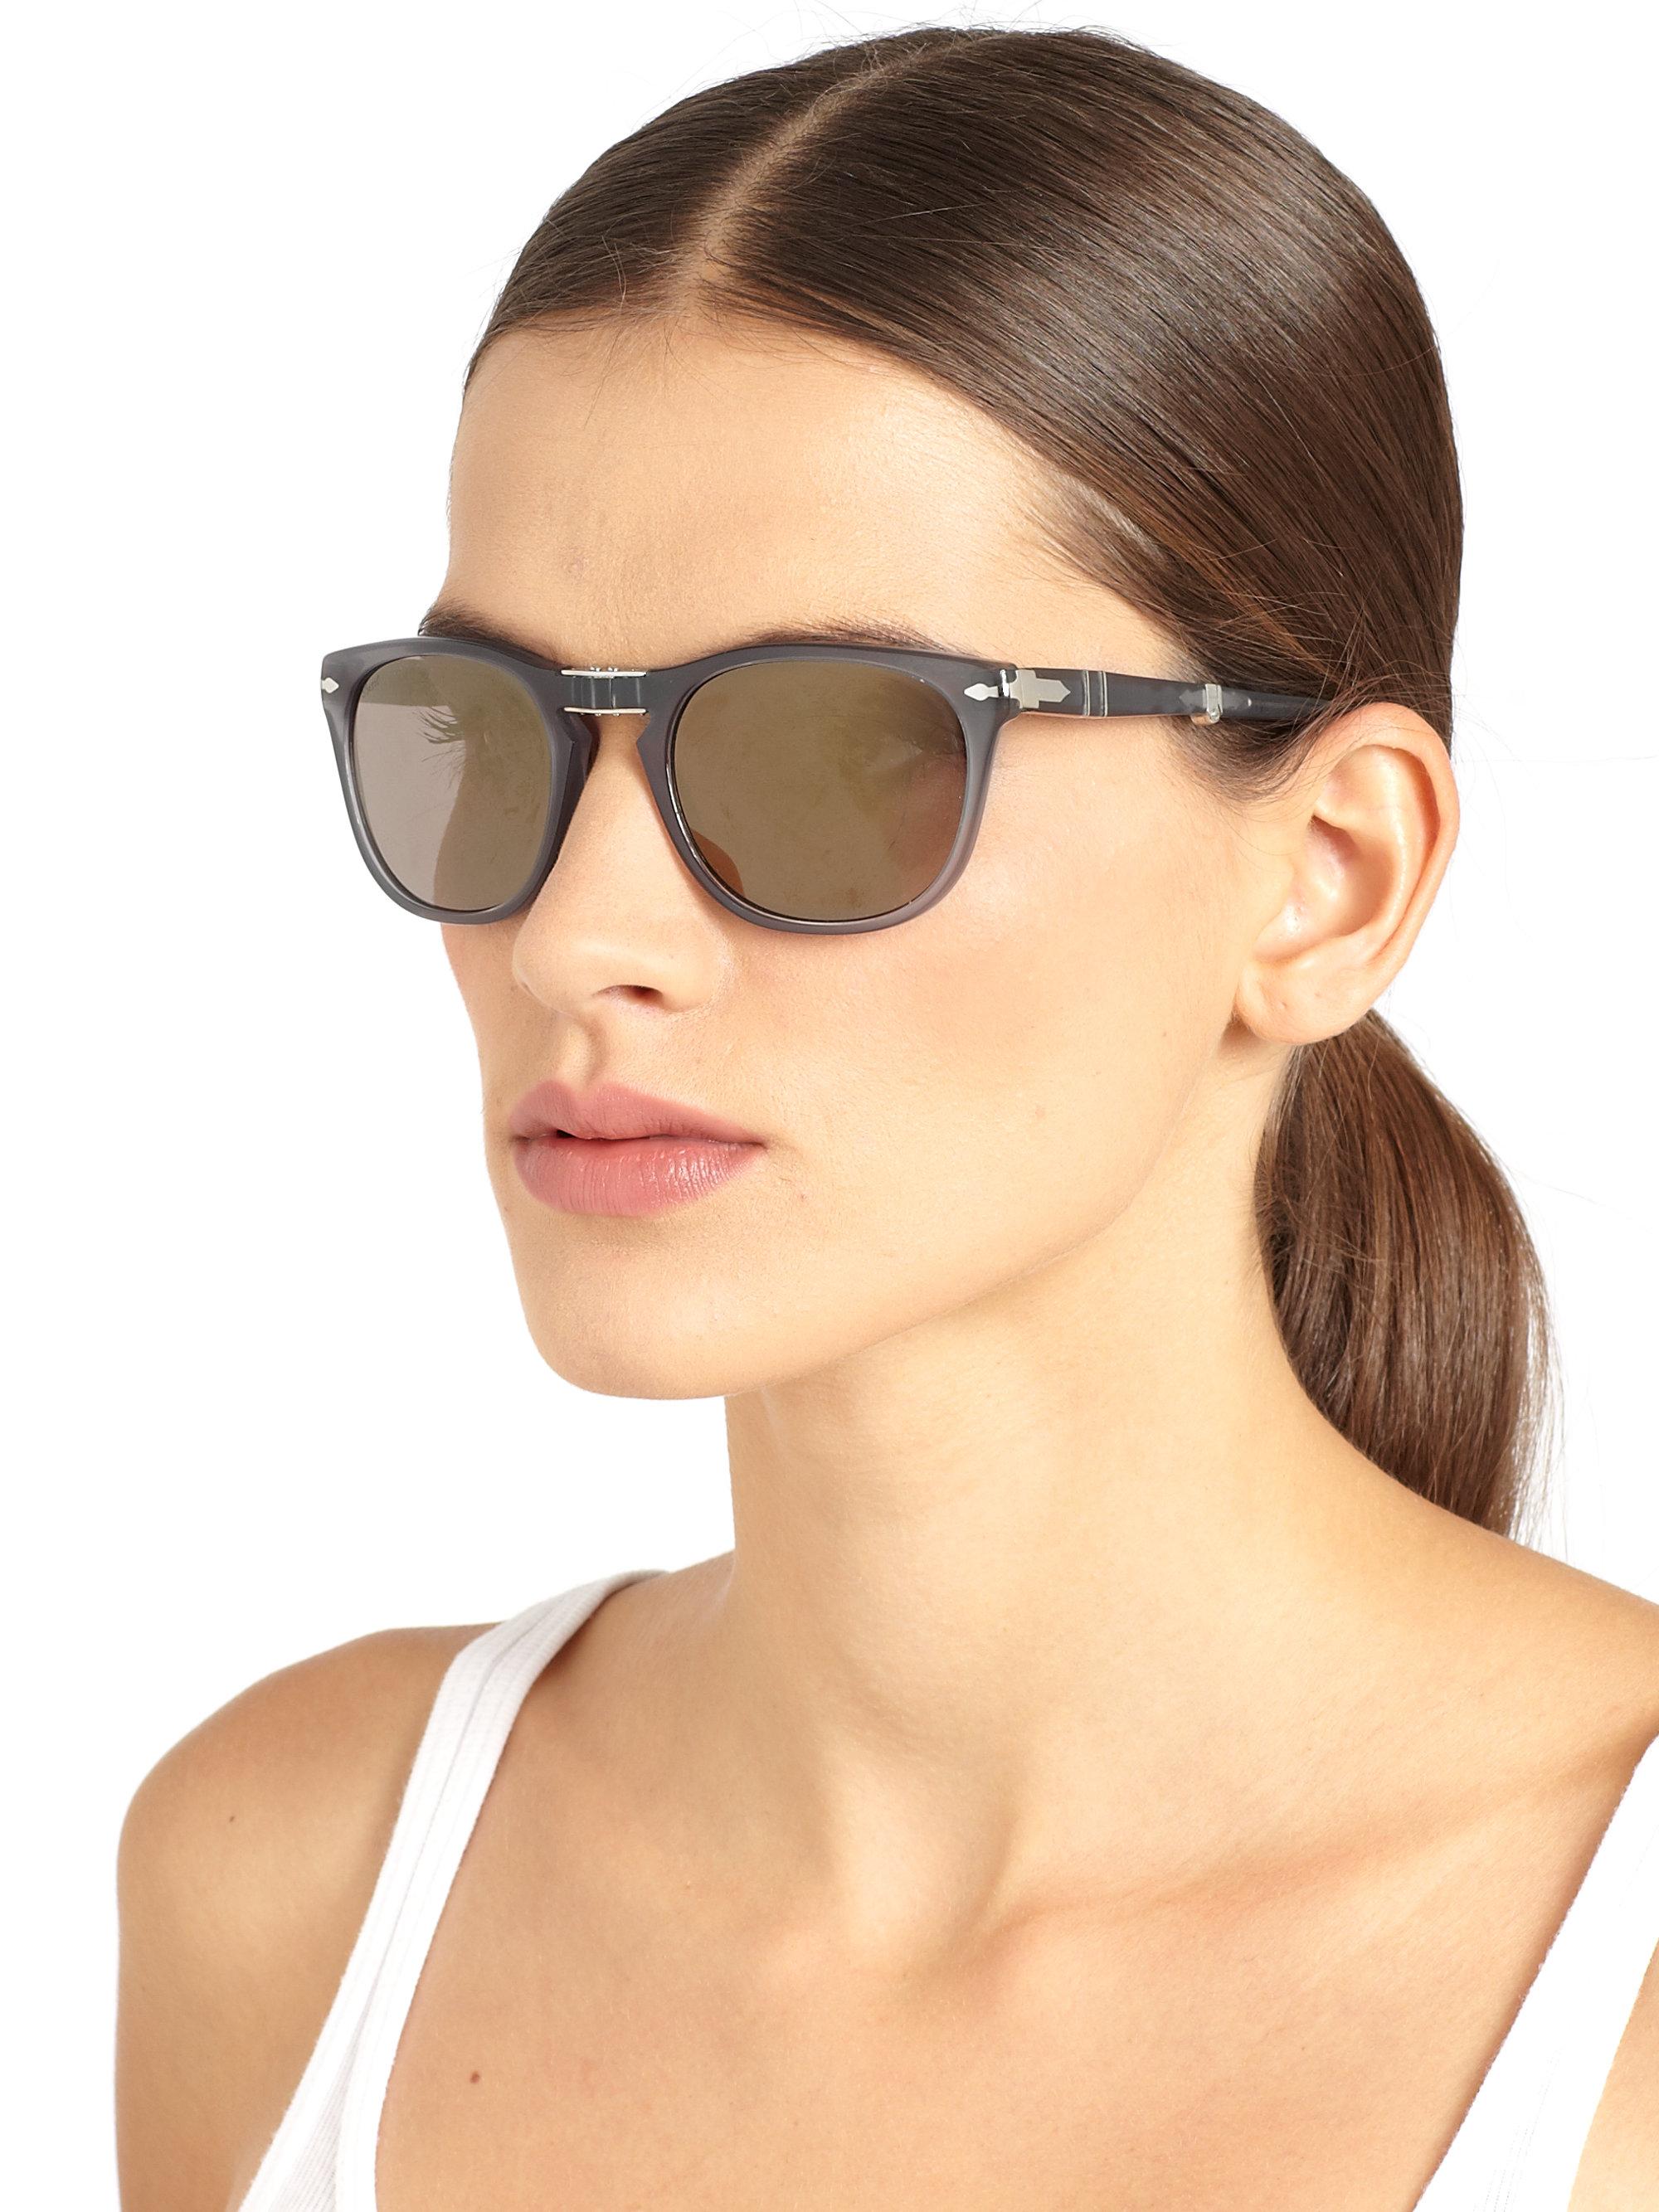 60aa2aa2fac5 Persol Folding Keyhole Acetate Sunglasses in Gray - Lyst